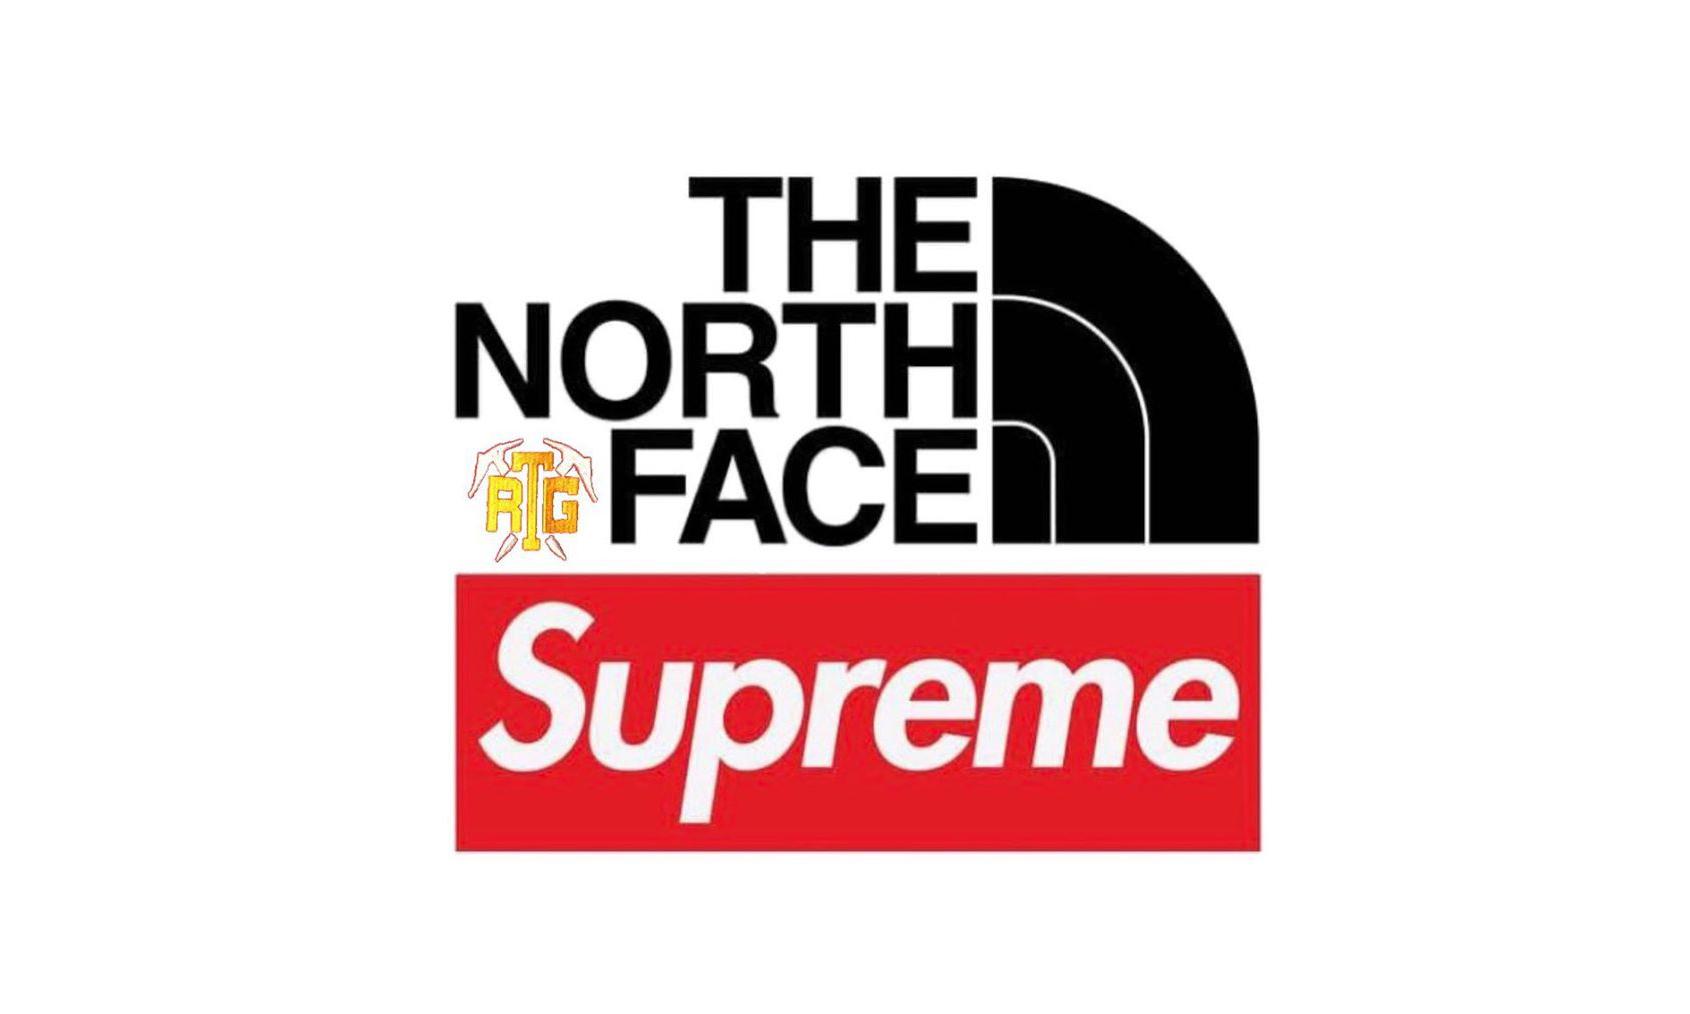 Supreme x THE NORTH FACE 20 春夏系列将于本周发布